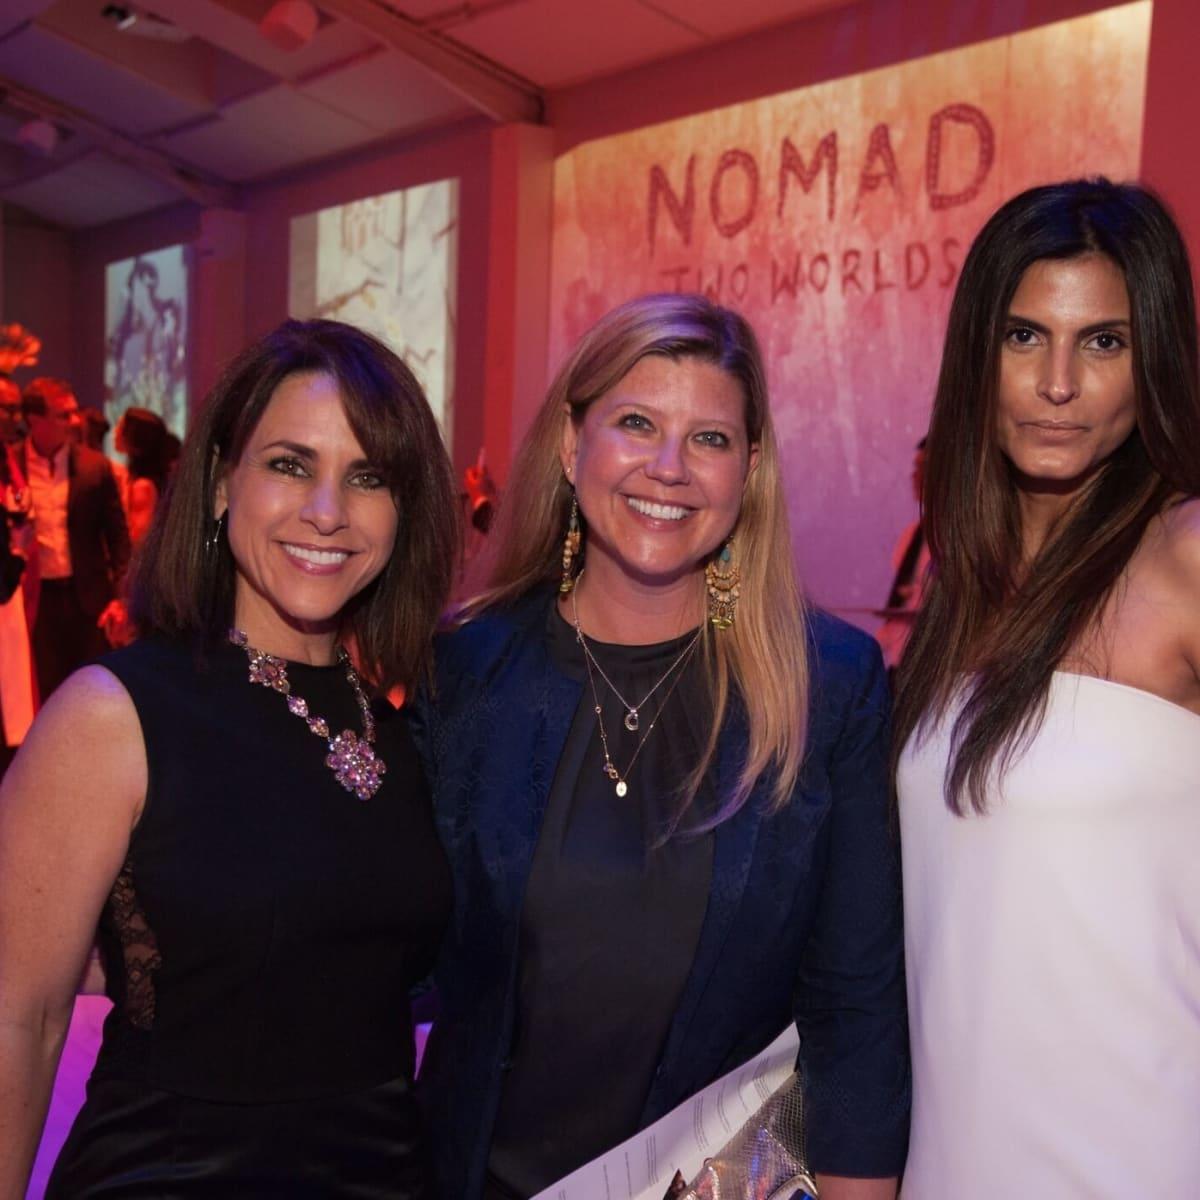 Marian Bush, Kackie Macha, Sabiha Remutalla at Nomad fundraiser